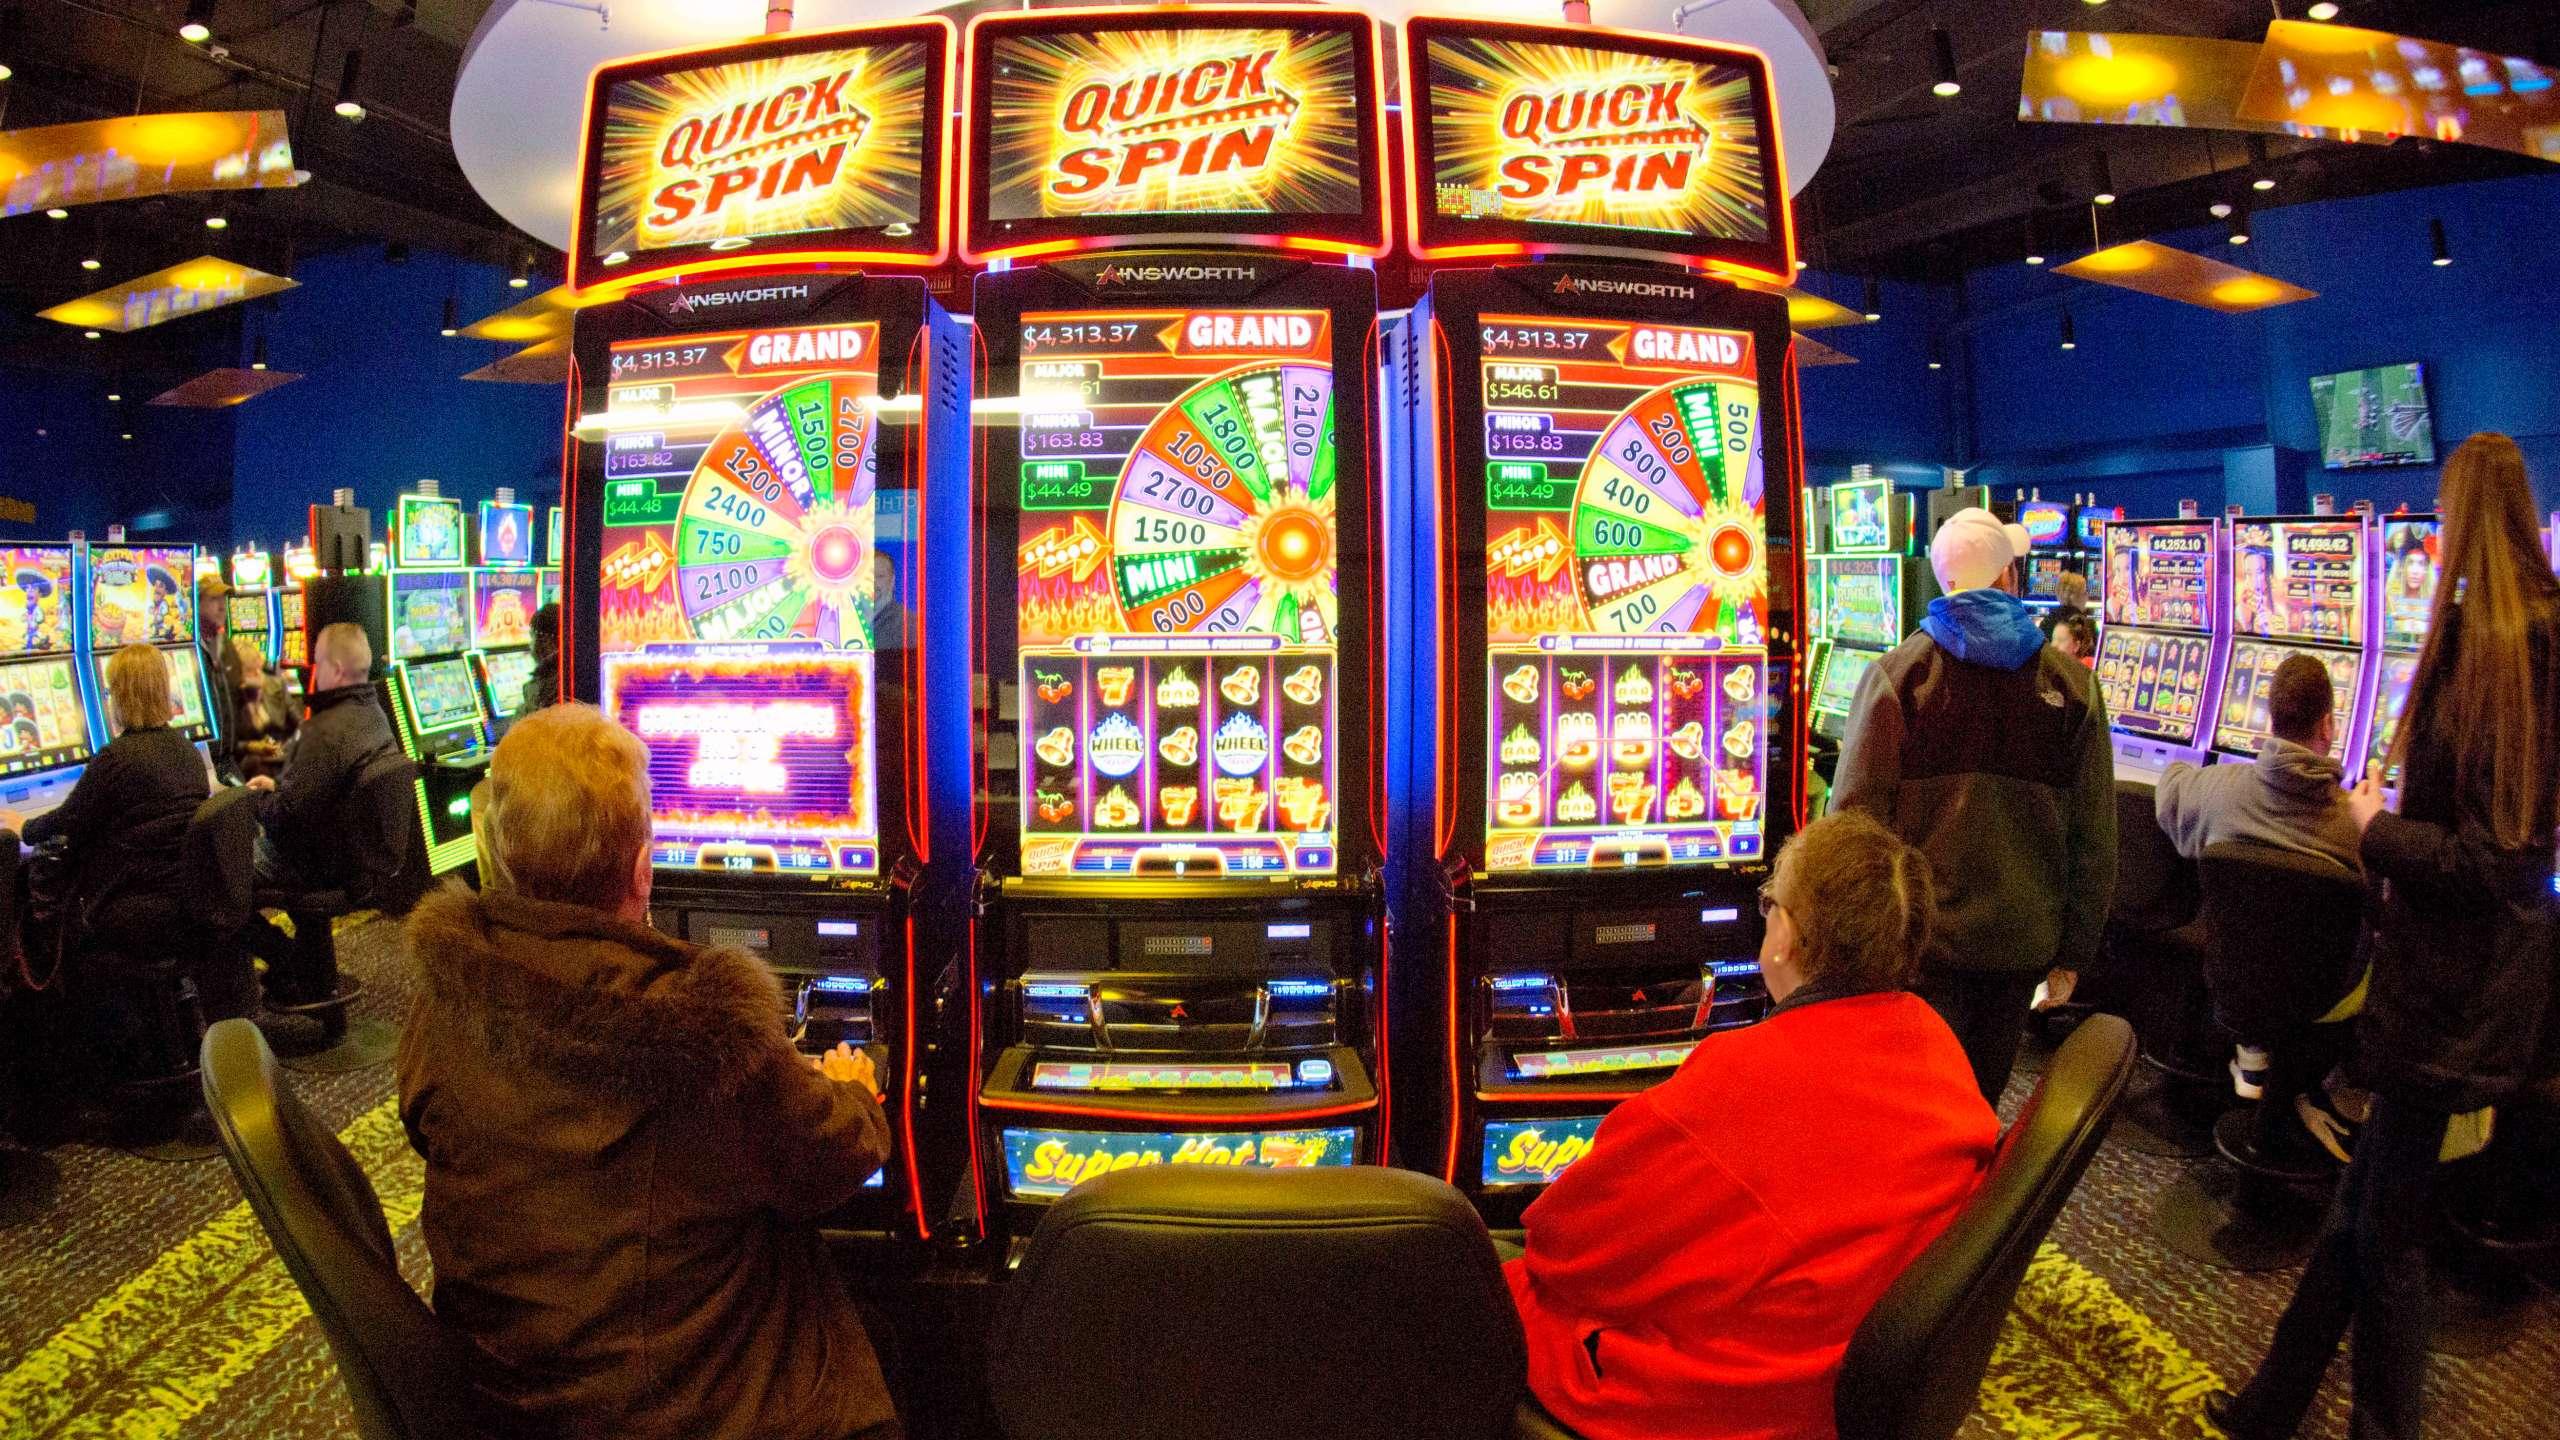 Tribal_Casino_Fight_75826-159532.jpg55811608